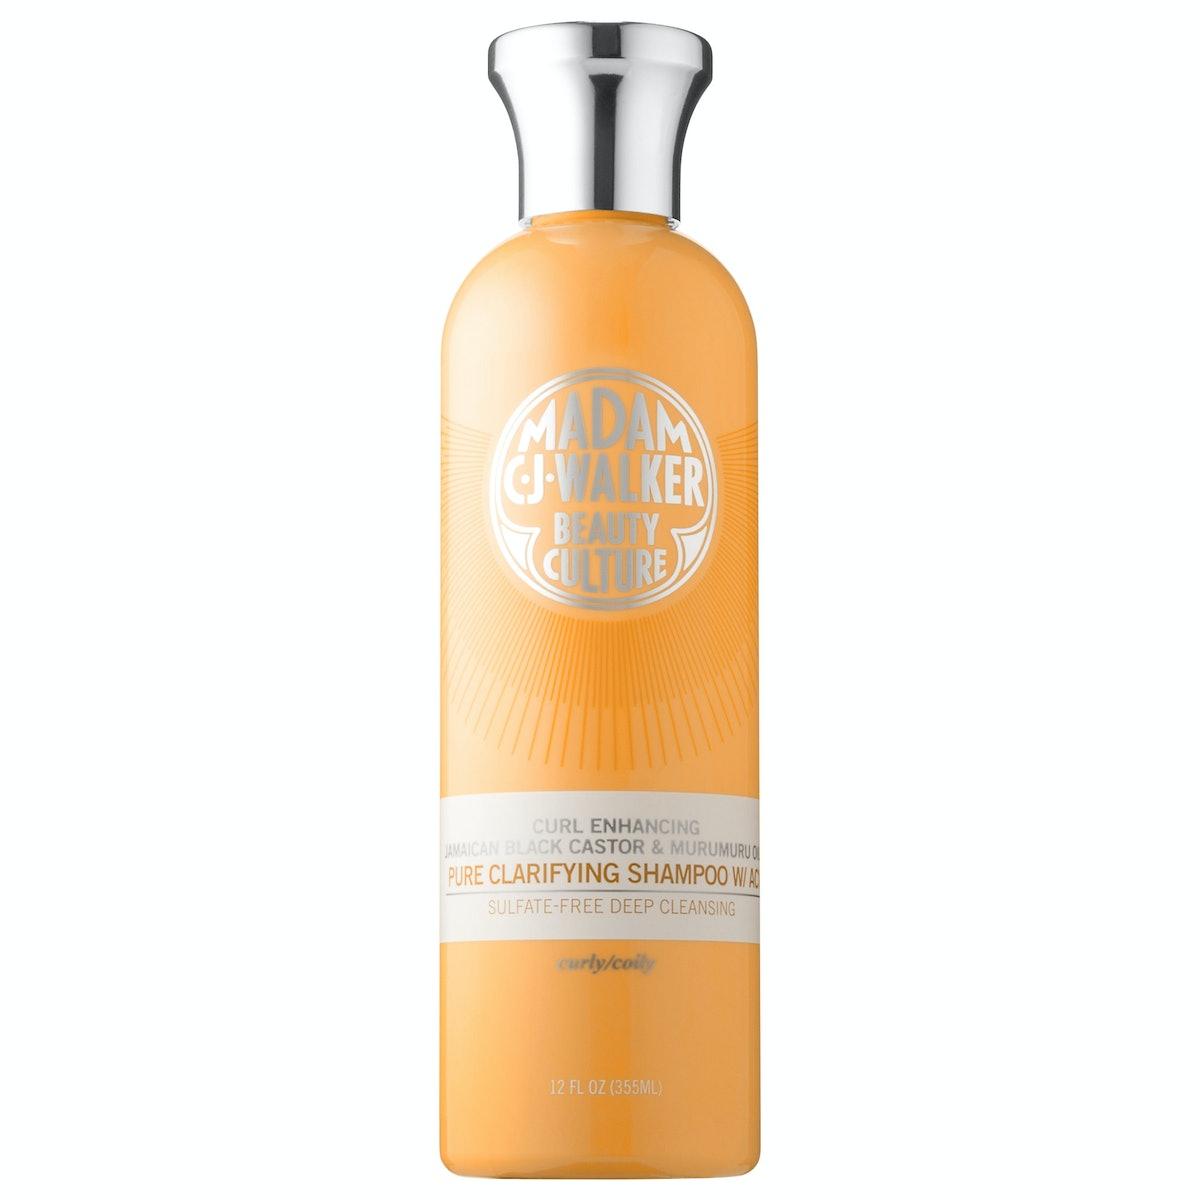 Madam C.J. Walker Beauty Culture Jamaican Black Castor & Murumuru Oils Pure Clarifying Shampoo with ...